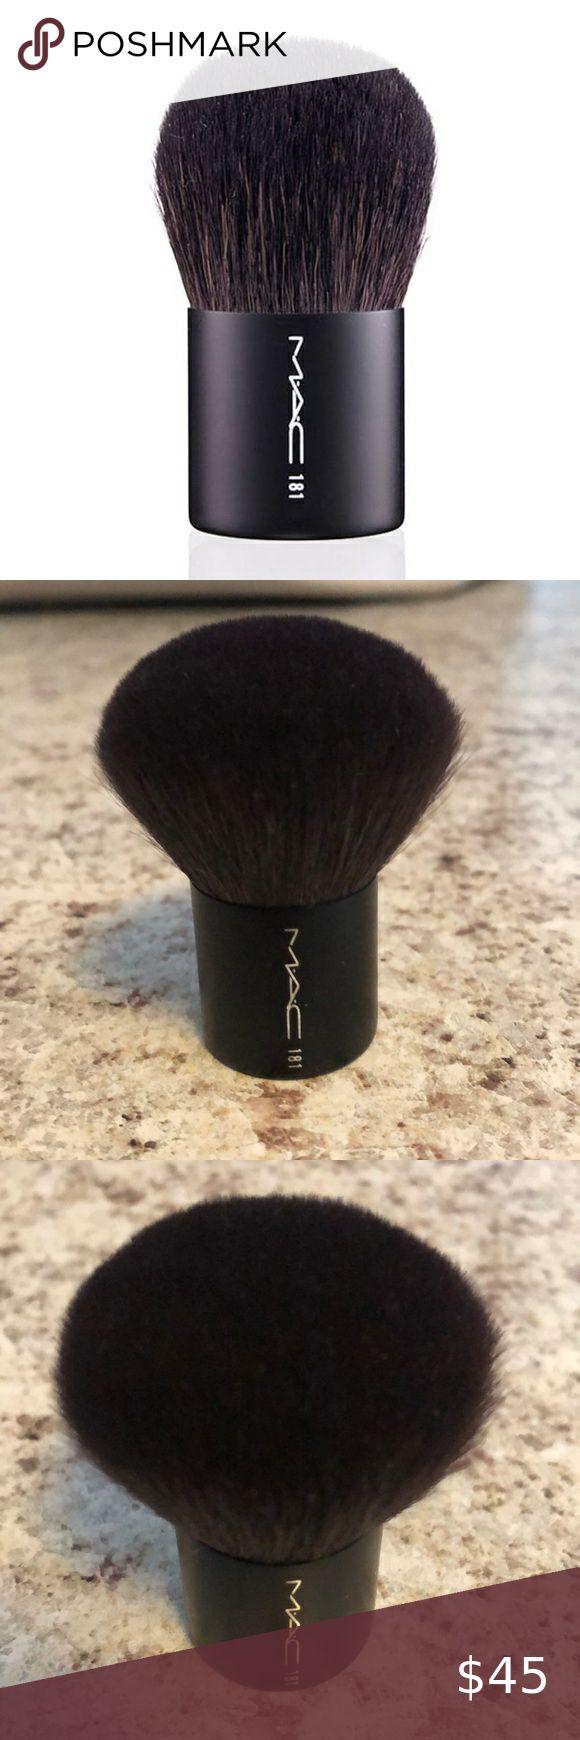 NWOB MAC 181 Small Buffer Brush in 2020 Basic makeup kit